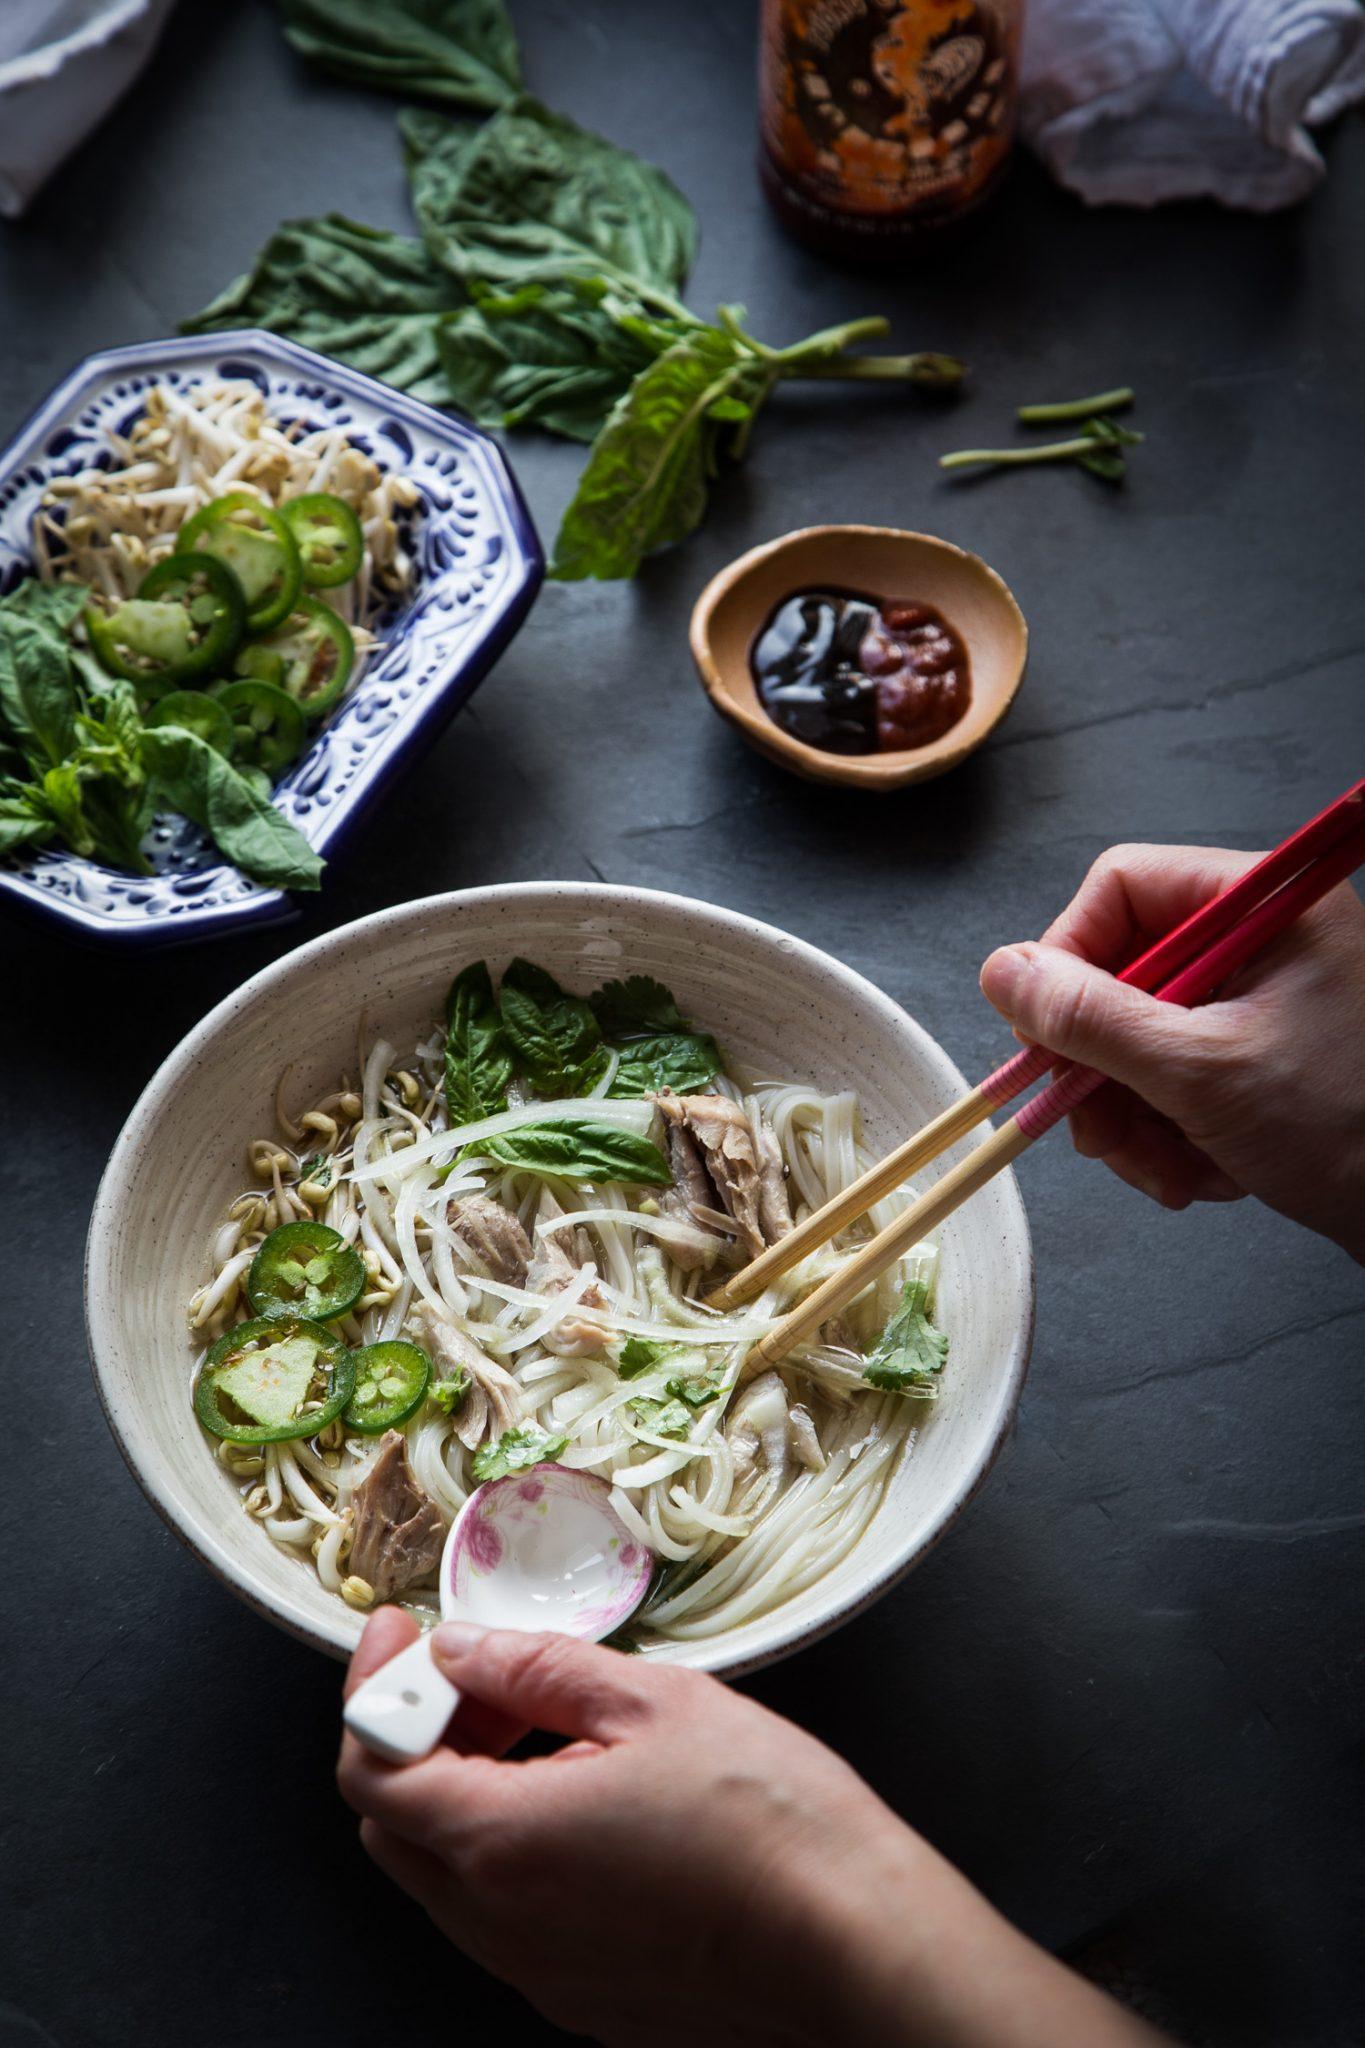 Pressure Cooker Pho Ga (Vietnamese Chicken Pho Noodle Soup) #instantpot #pho #phoga #pressurecooker #vietnamesepho